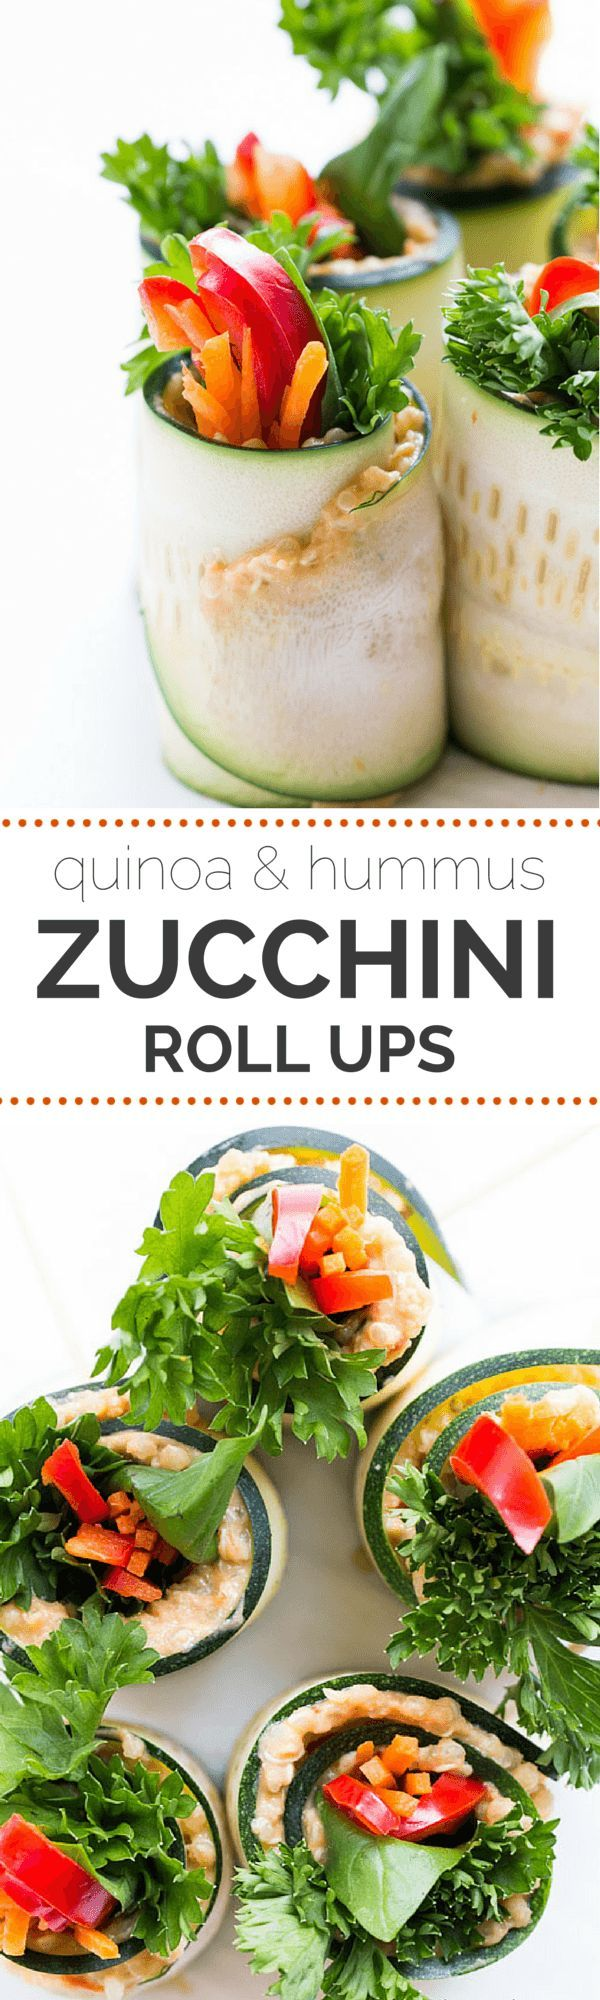 Your new favorite snack--Zucchini Roll Ups with quinoa, hummus and fresh veggies